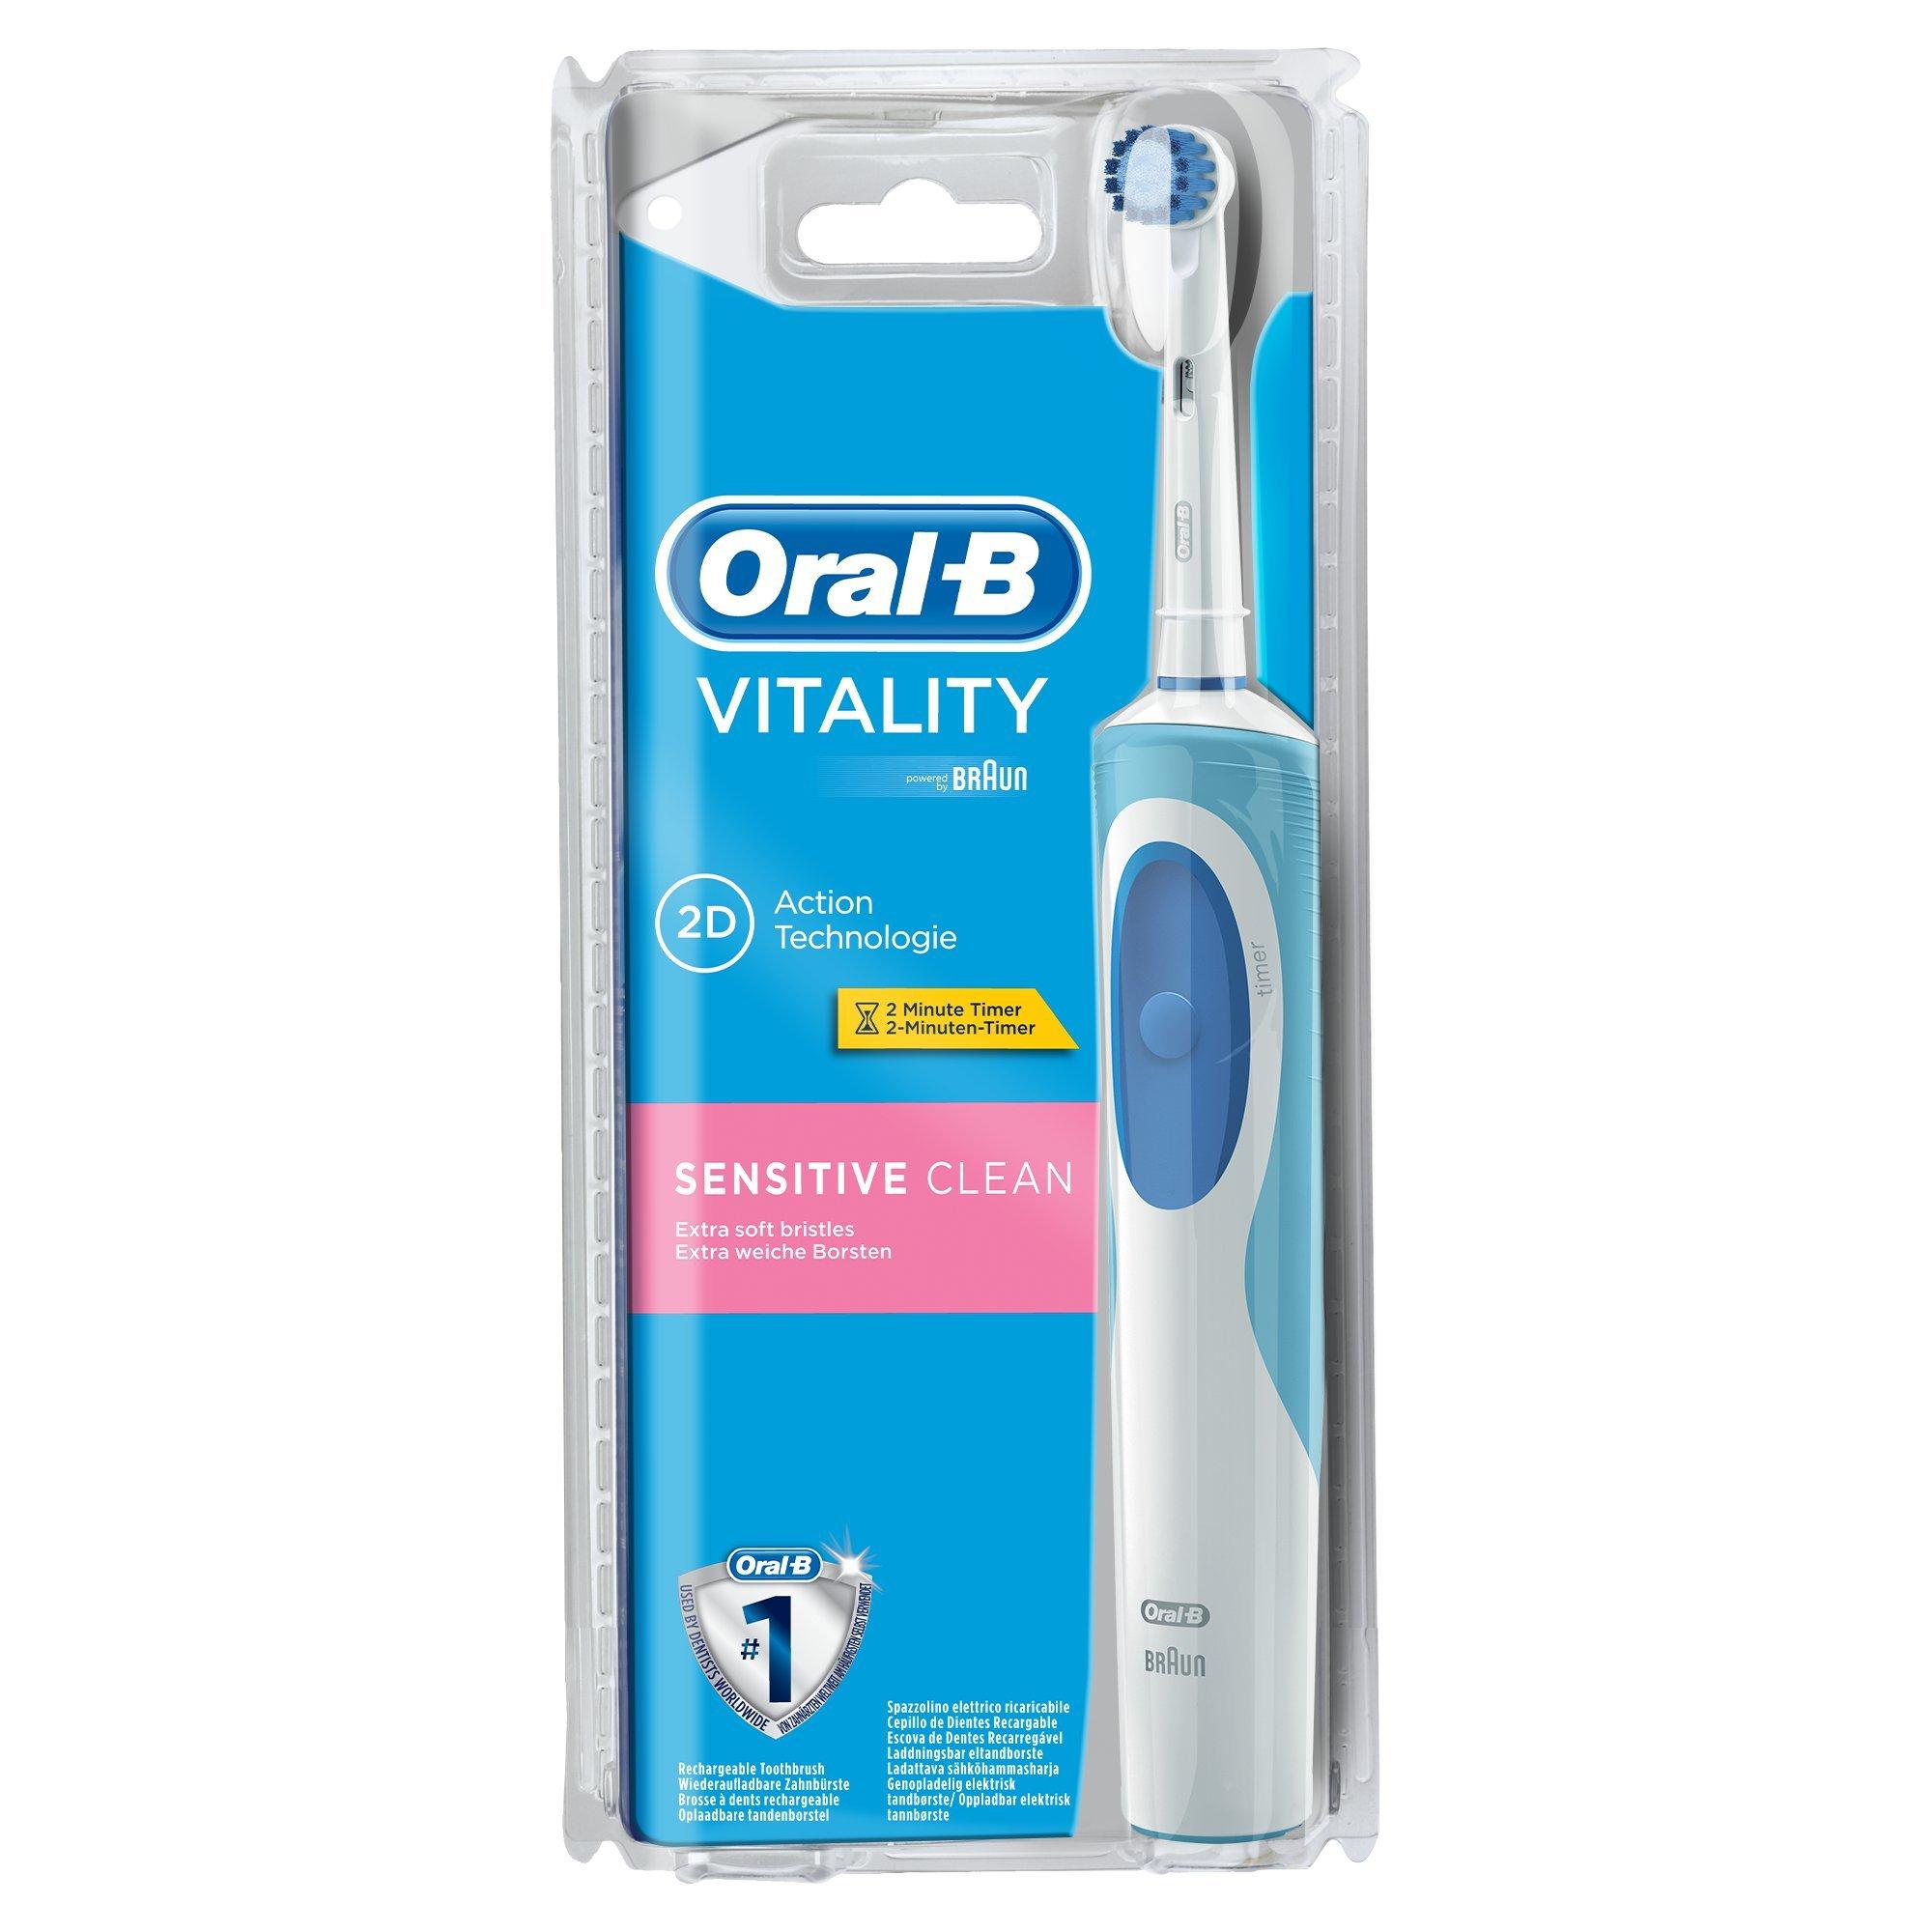 Oral-B Vitality D12513 Sensitive Cepillo de dientes con cabezal product image